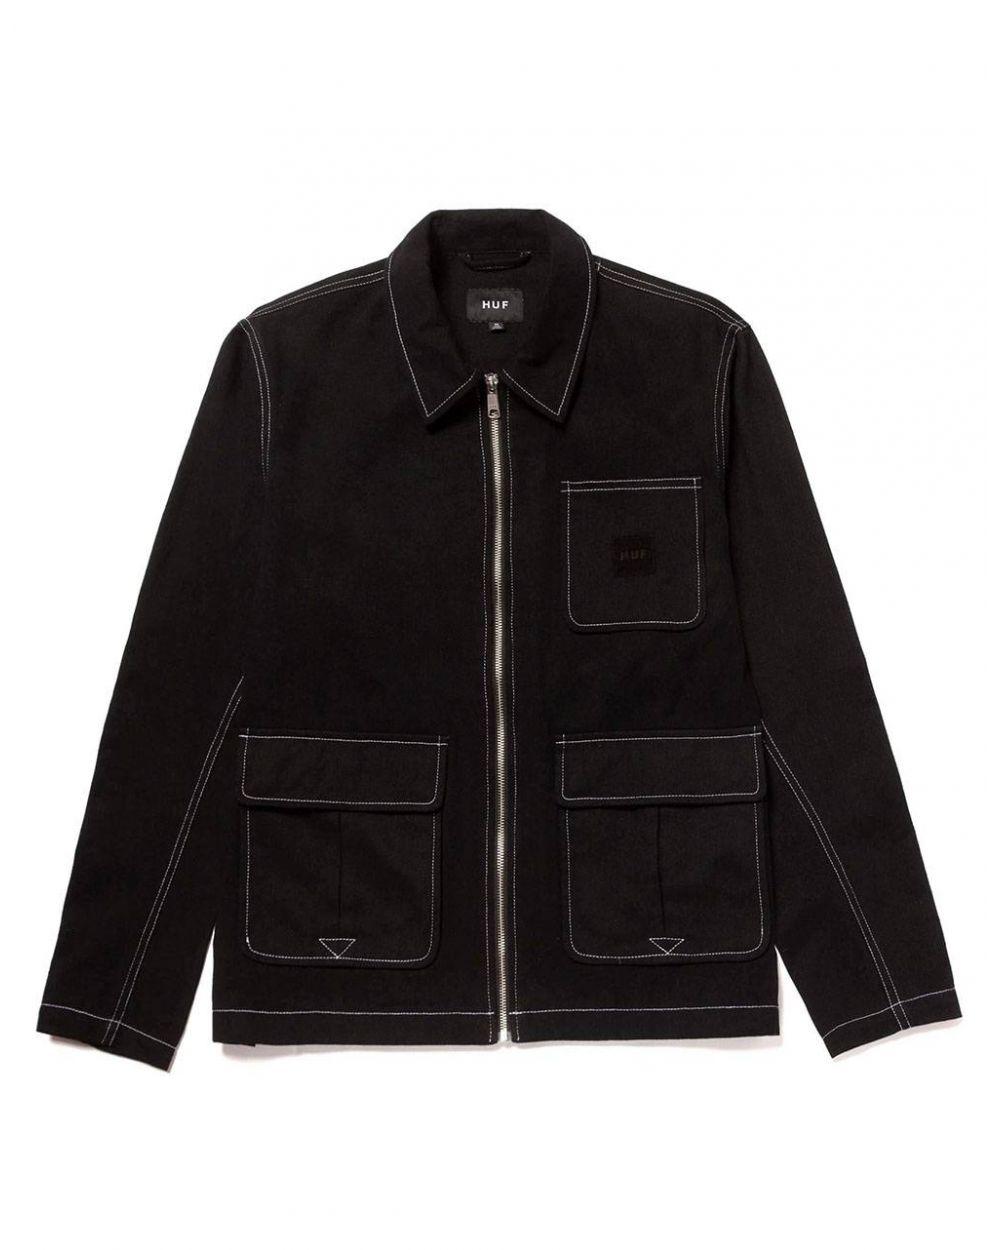 Huf Canyon Jacket - black Huf Jacket 122,13€